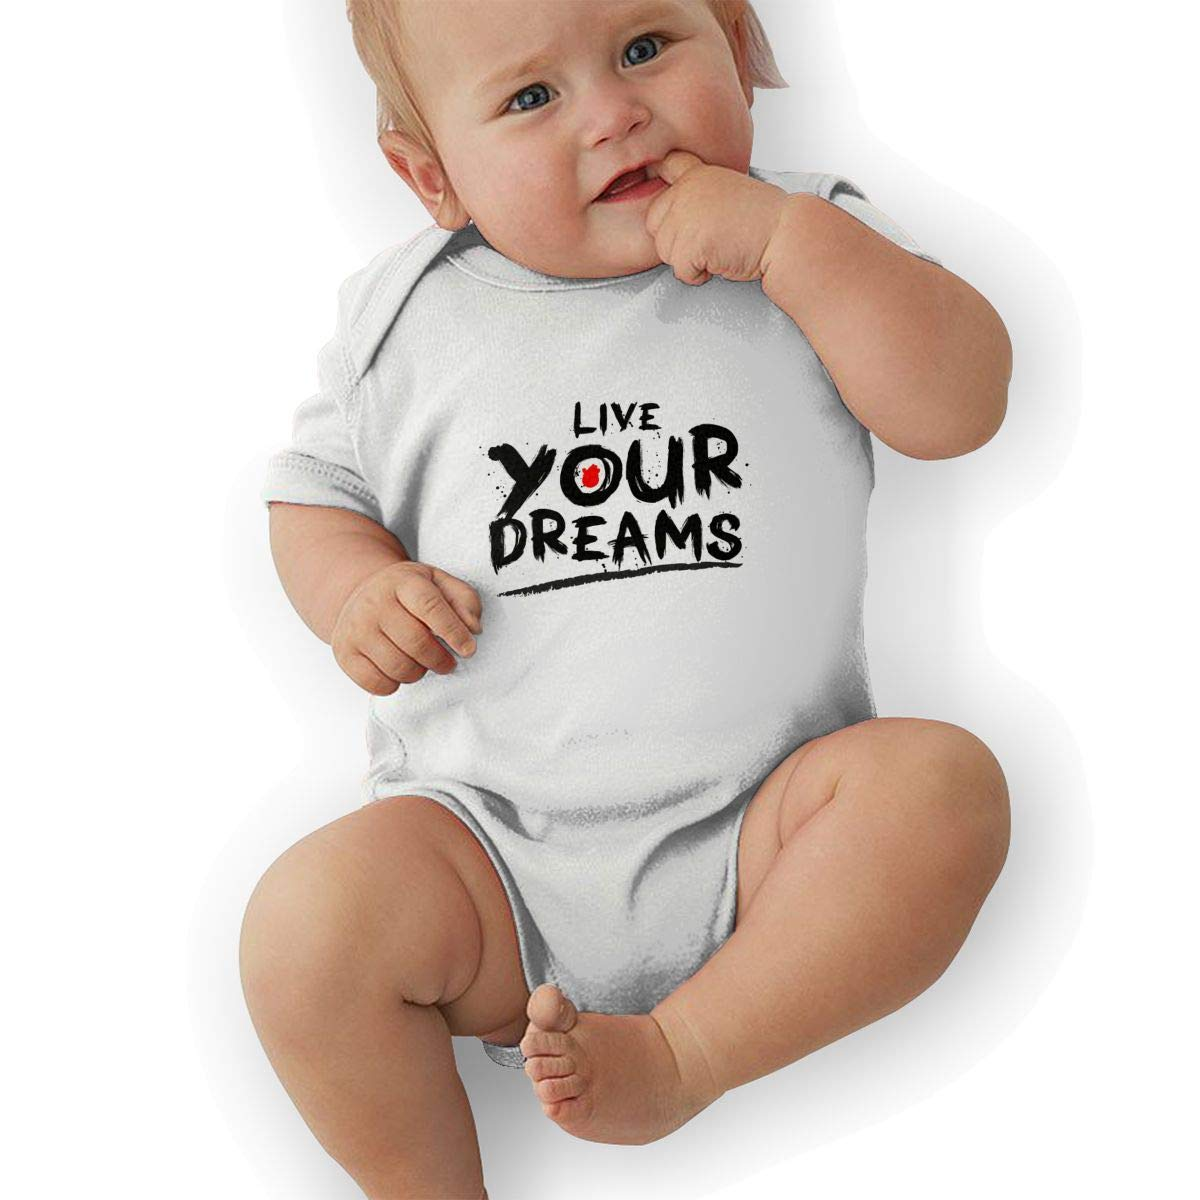 Infant Baby Girls Bodysuit Short-Sleeve Onesie Live Your Dreams Print Rompers Summer Pajamas